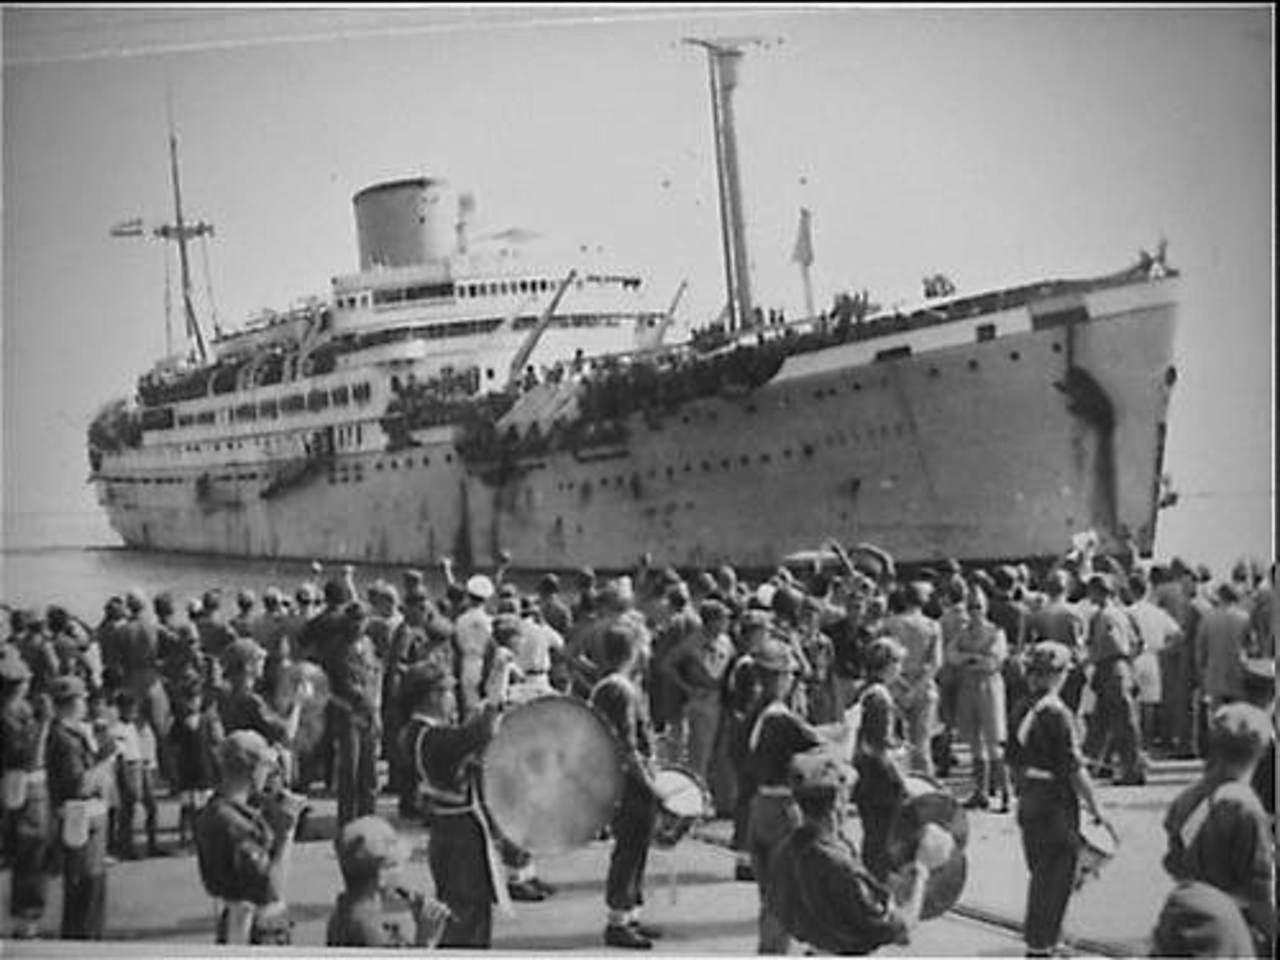 Beberapa hari setelah proklamasi kemerdekaan Republik Indonesia, Belanda kembali datang diwakili oleh NICA